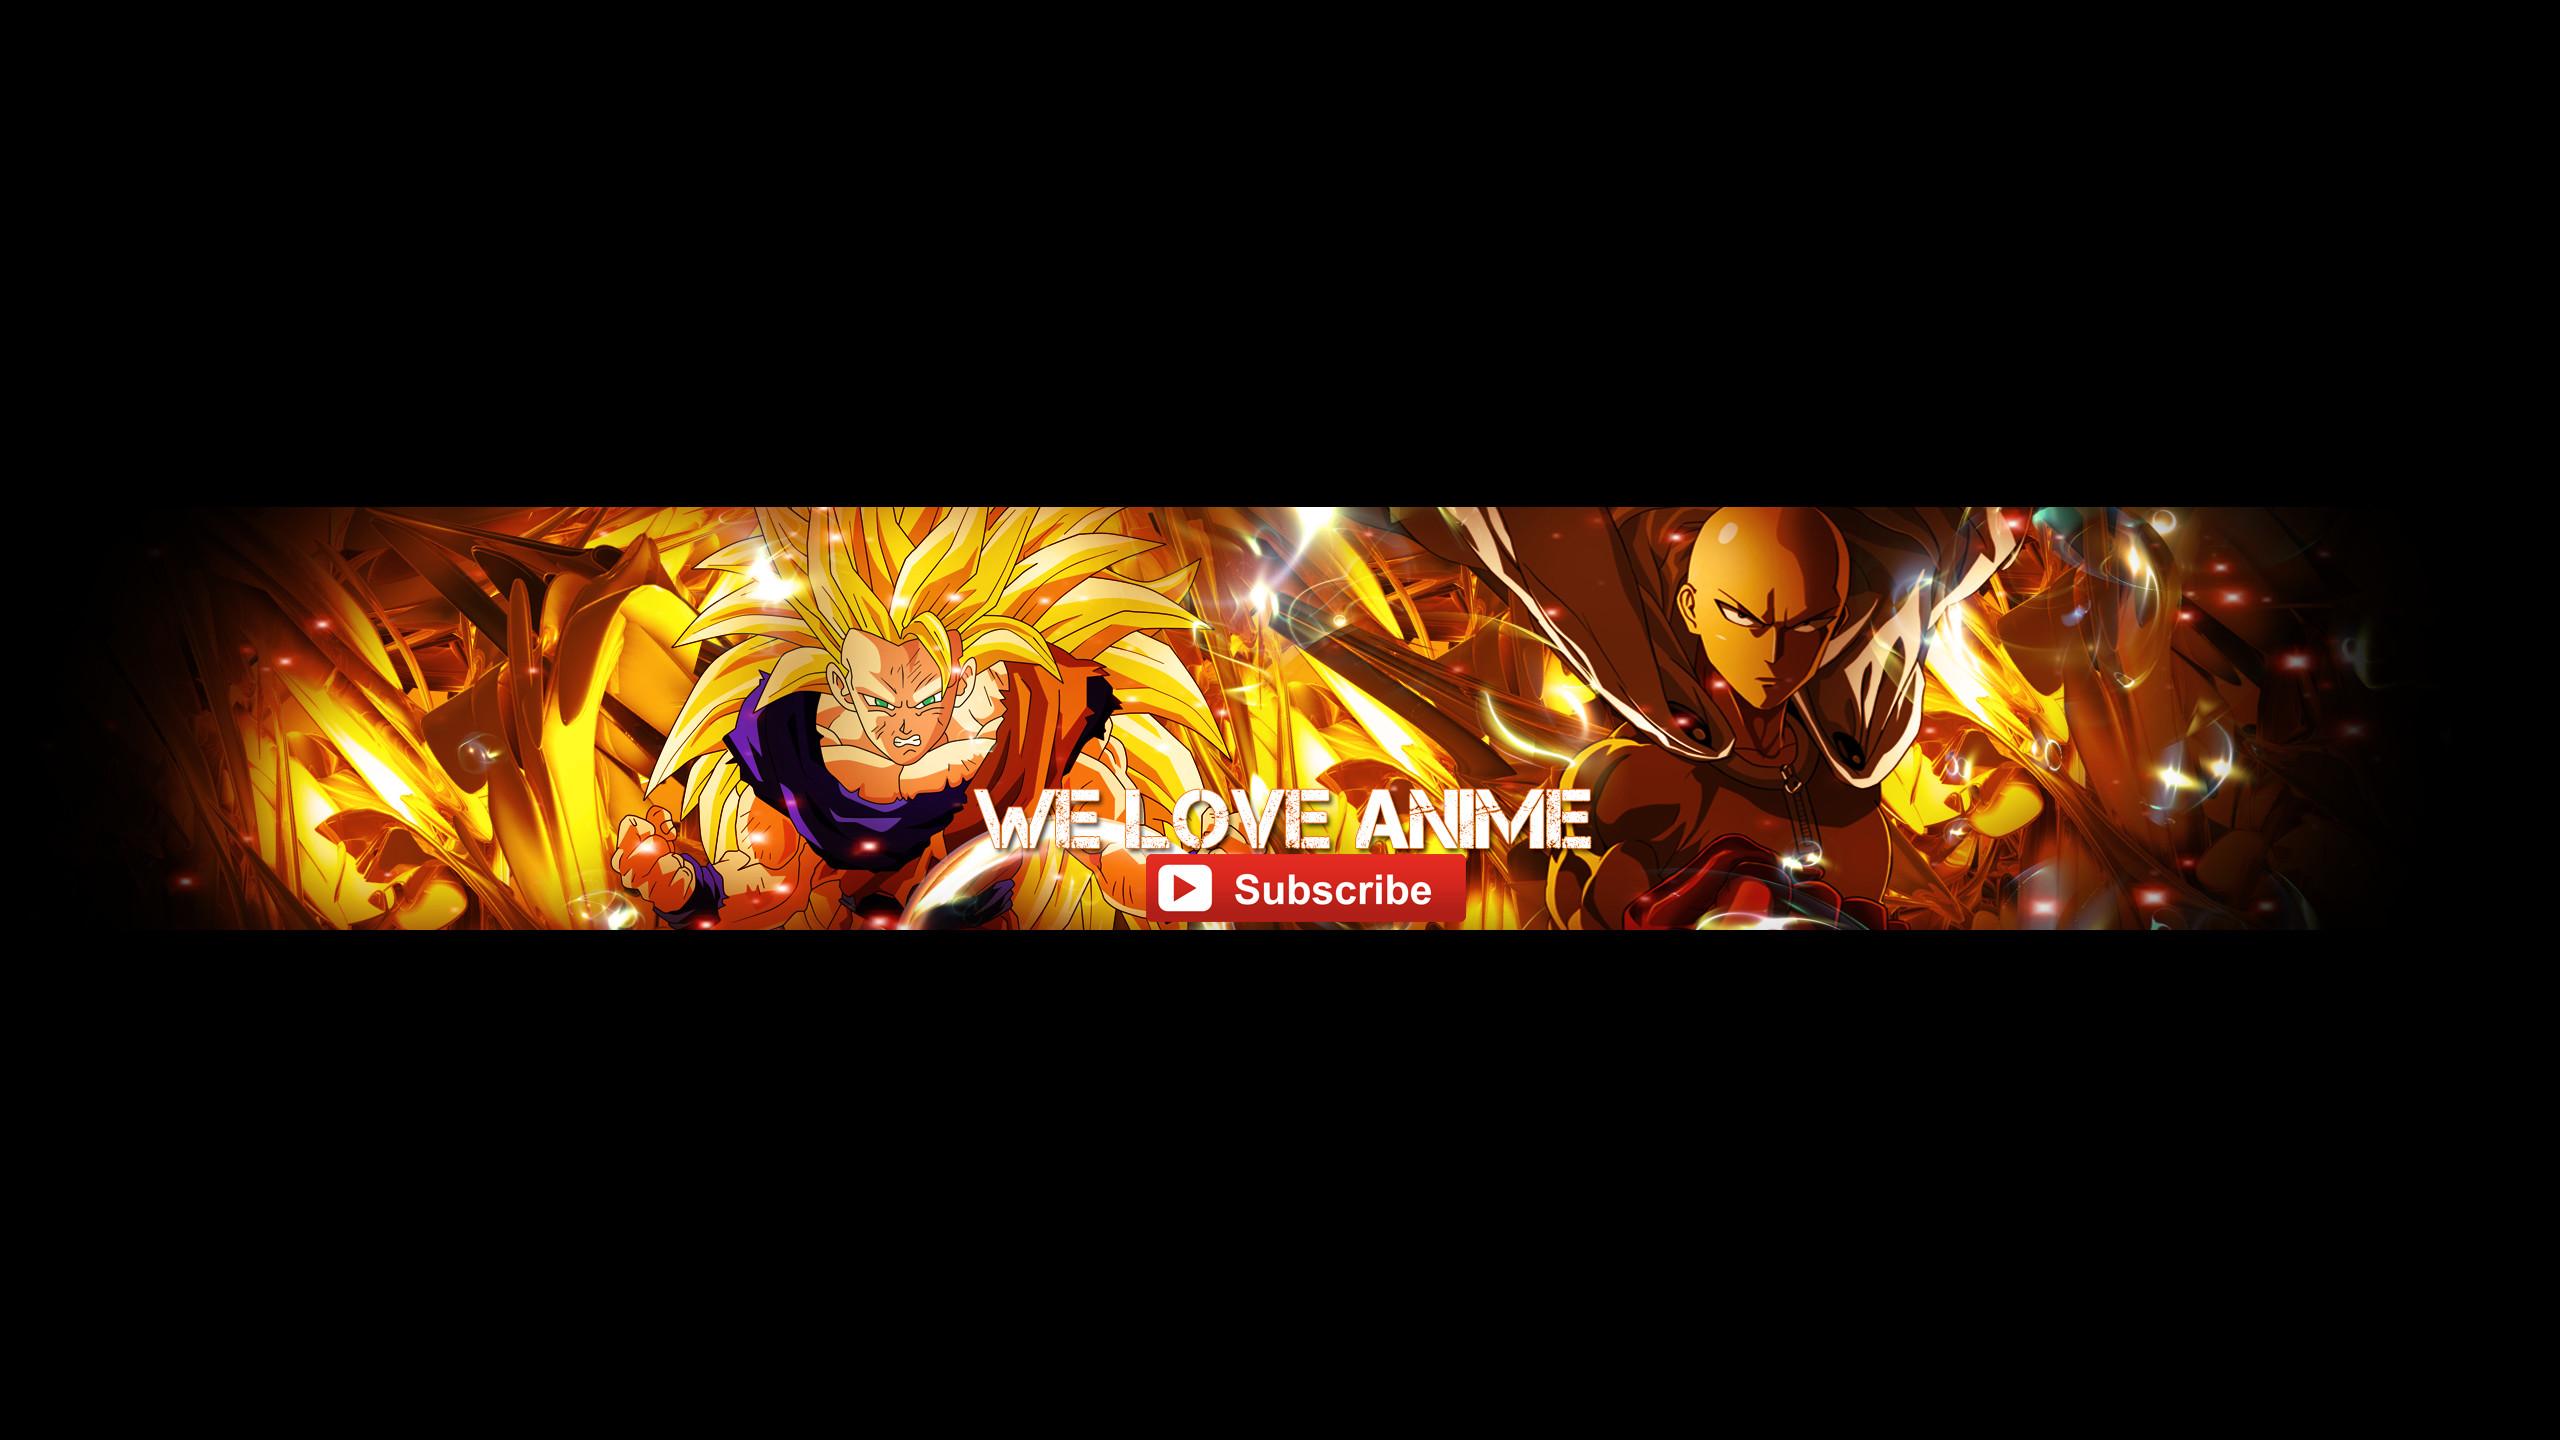 Anime Youtube Banner by ScarletSnowX Anime Youtube Banner by ScarletSnowX